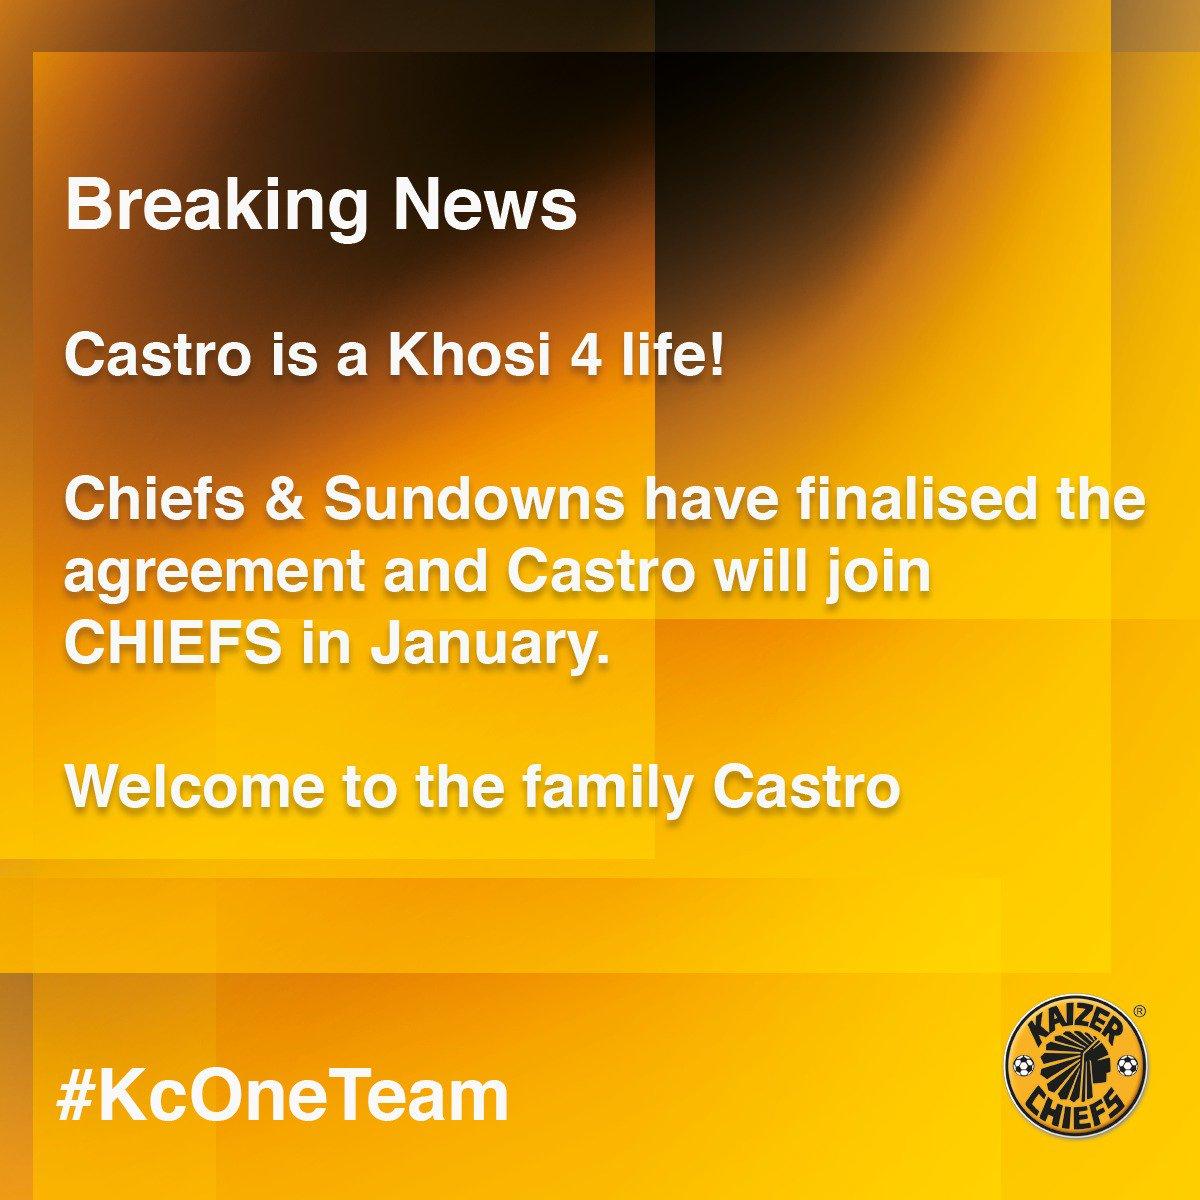 Breaking News: Leonardo Castro will join us in January #Amakhosi4Life #KCOneTeam